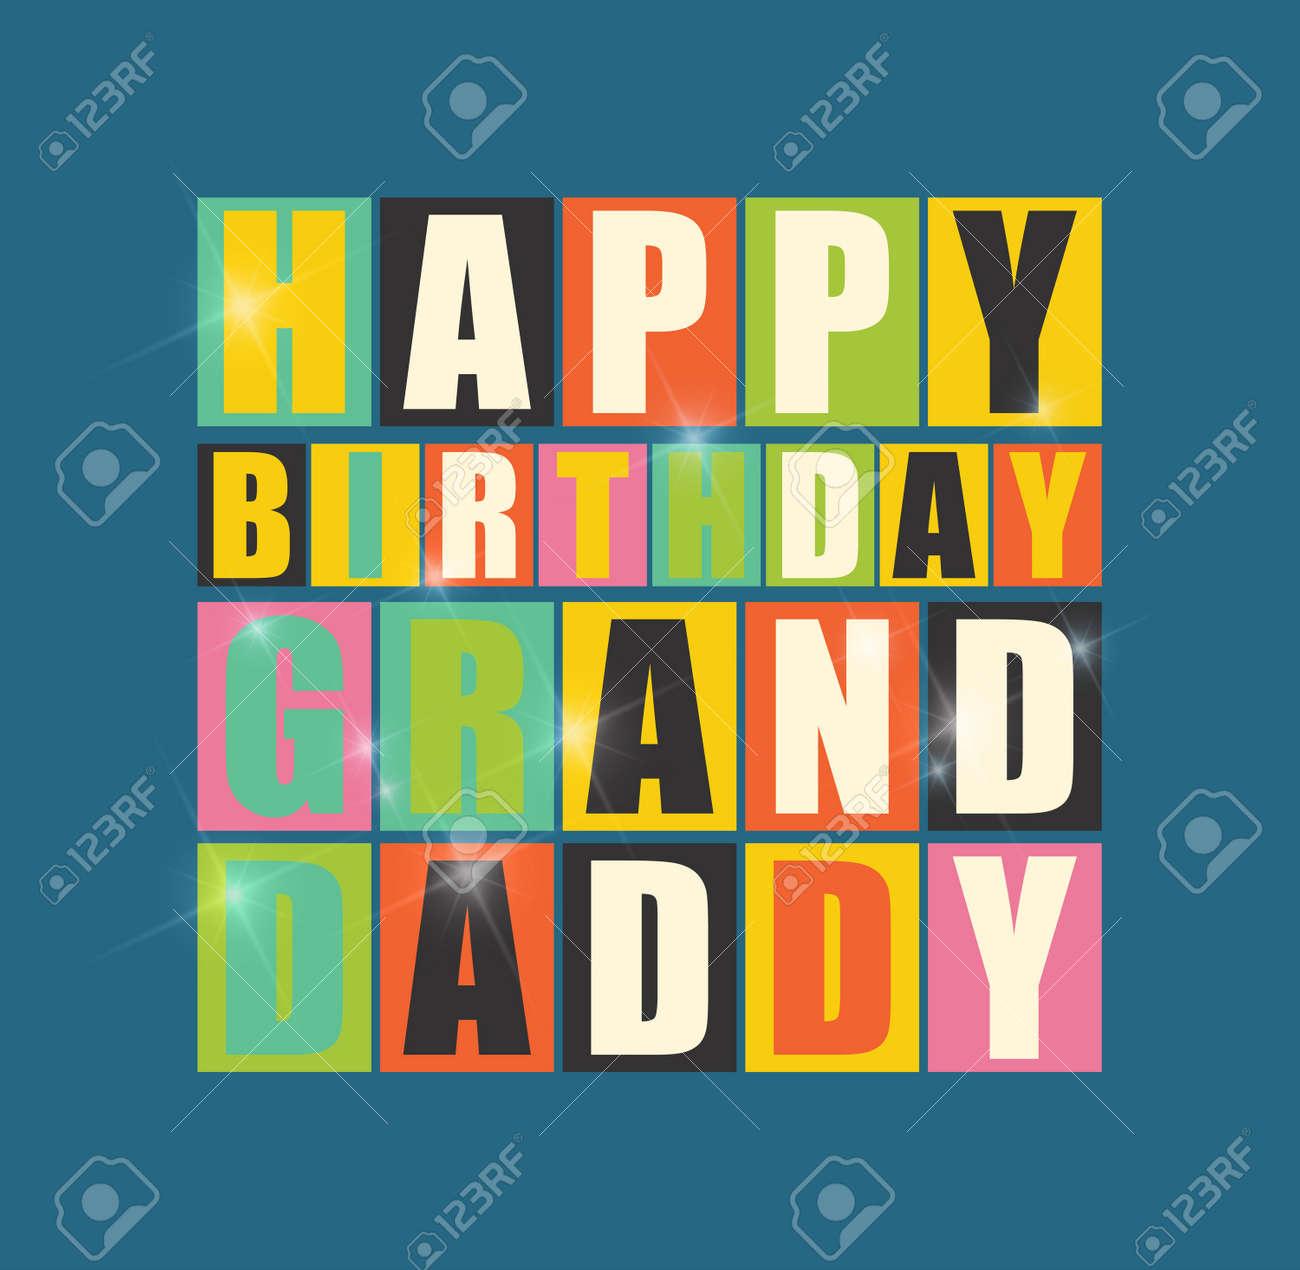 Retro happy birthday card happy birthday grand daddy vector retro happy birthday card happy birthday grand daddy vector illustration stock vector 57012972 bookmarktalkfo Images